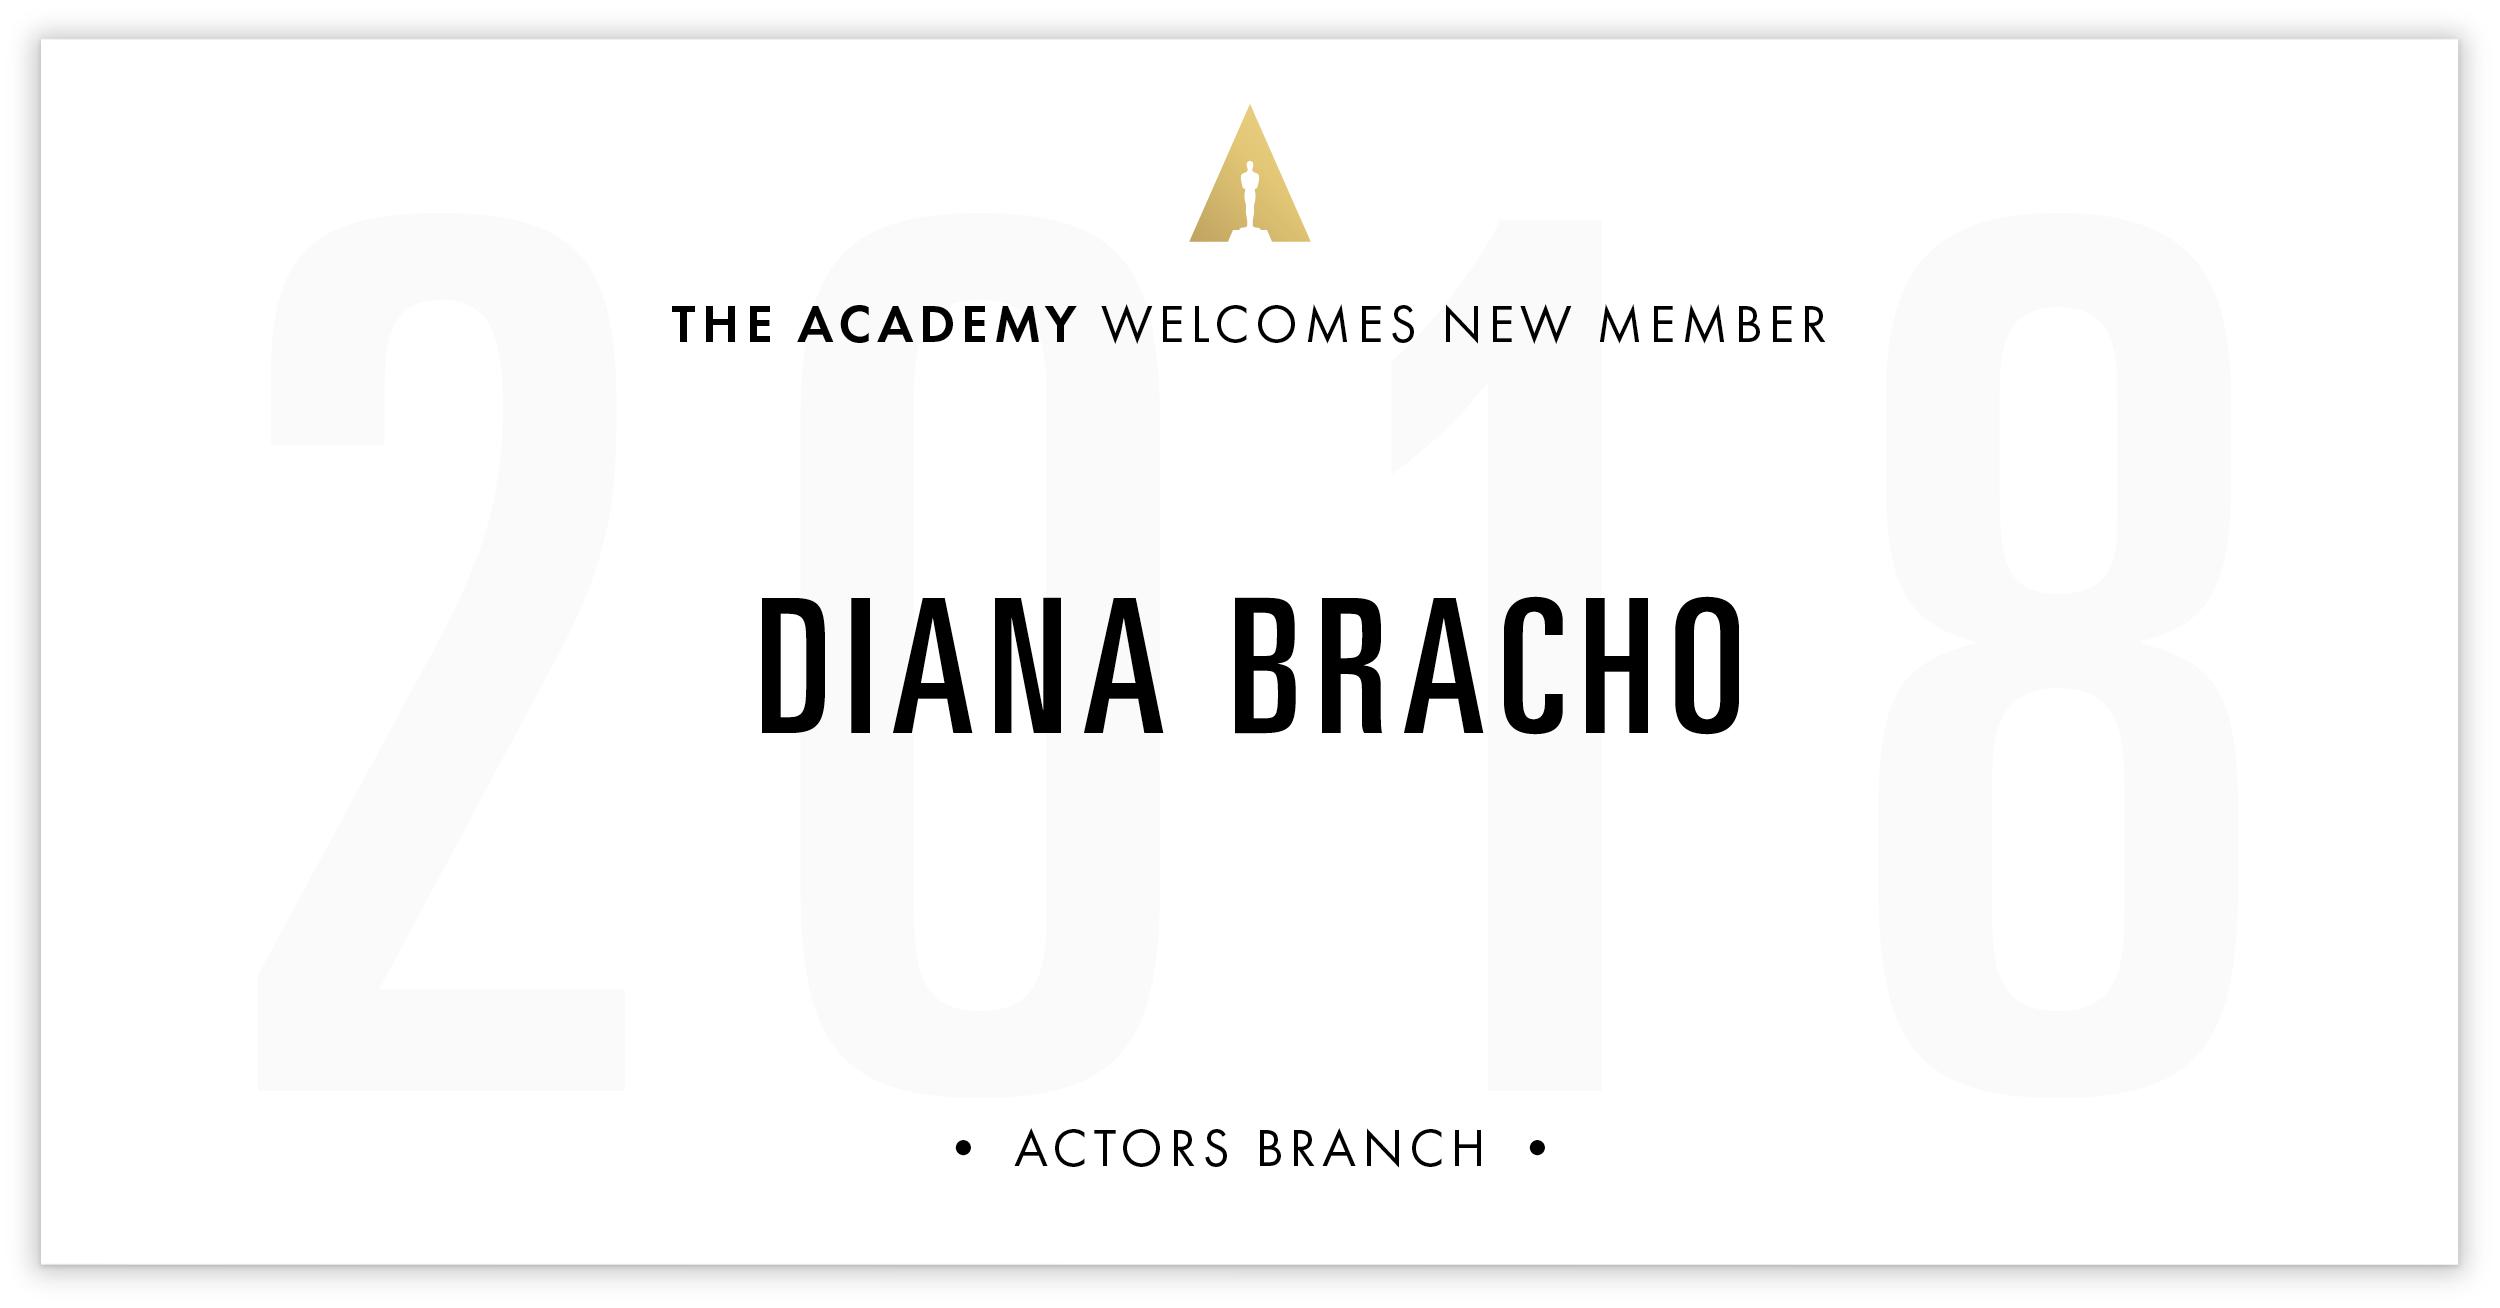 Diana Bracho is invited!